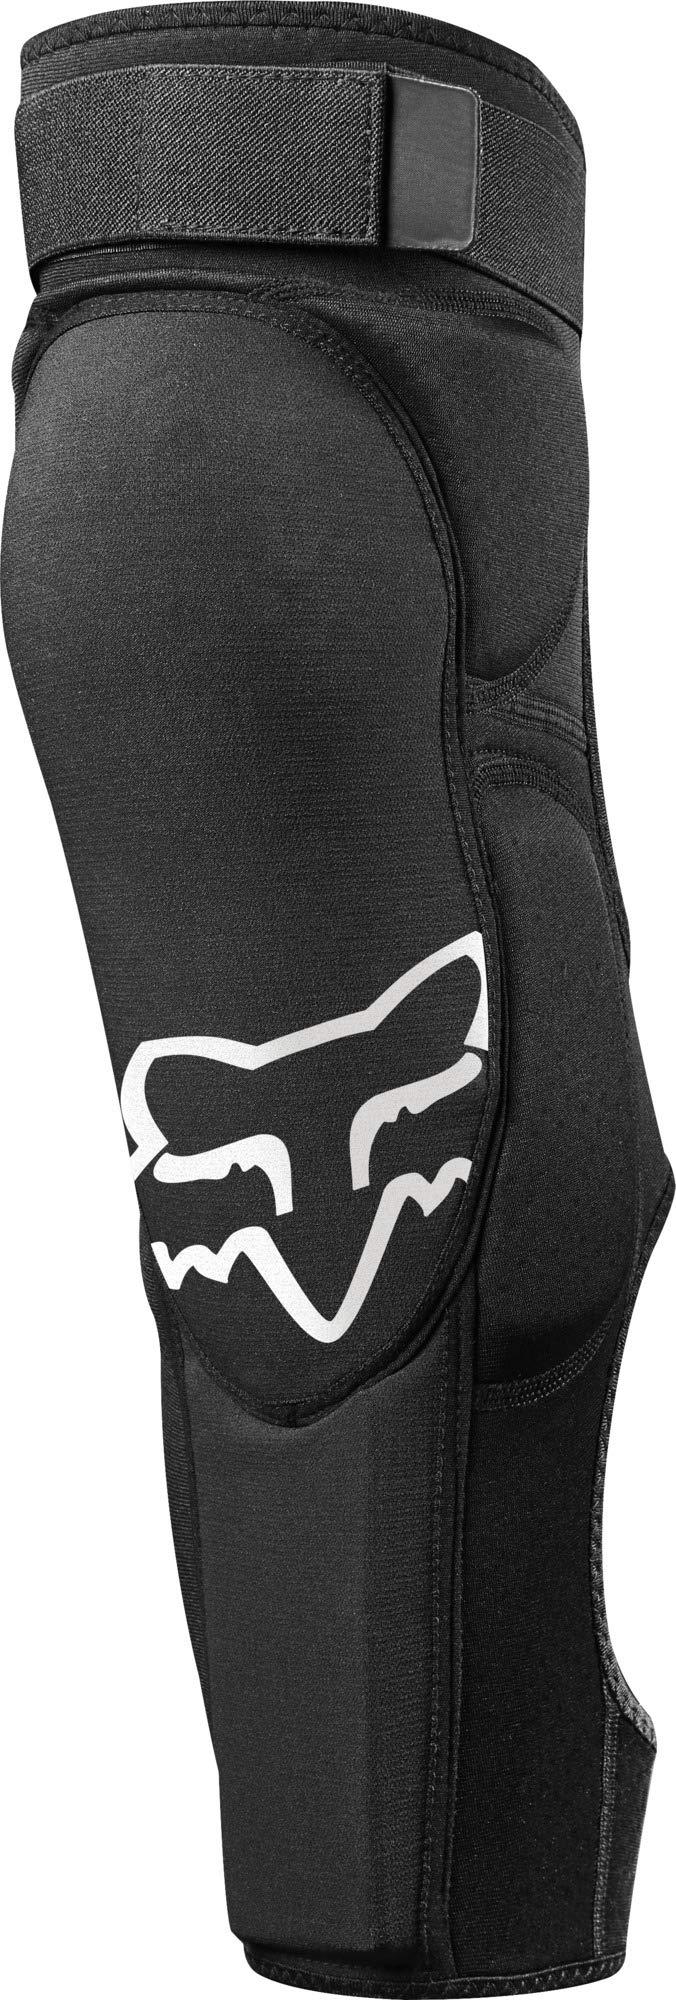 Fox Racing Launch Pro MTB Knee/Shin Guard (Black, Small)